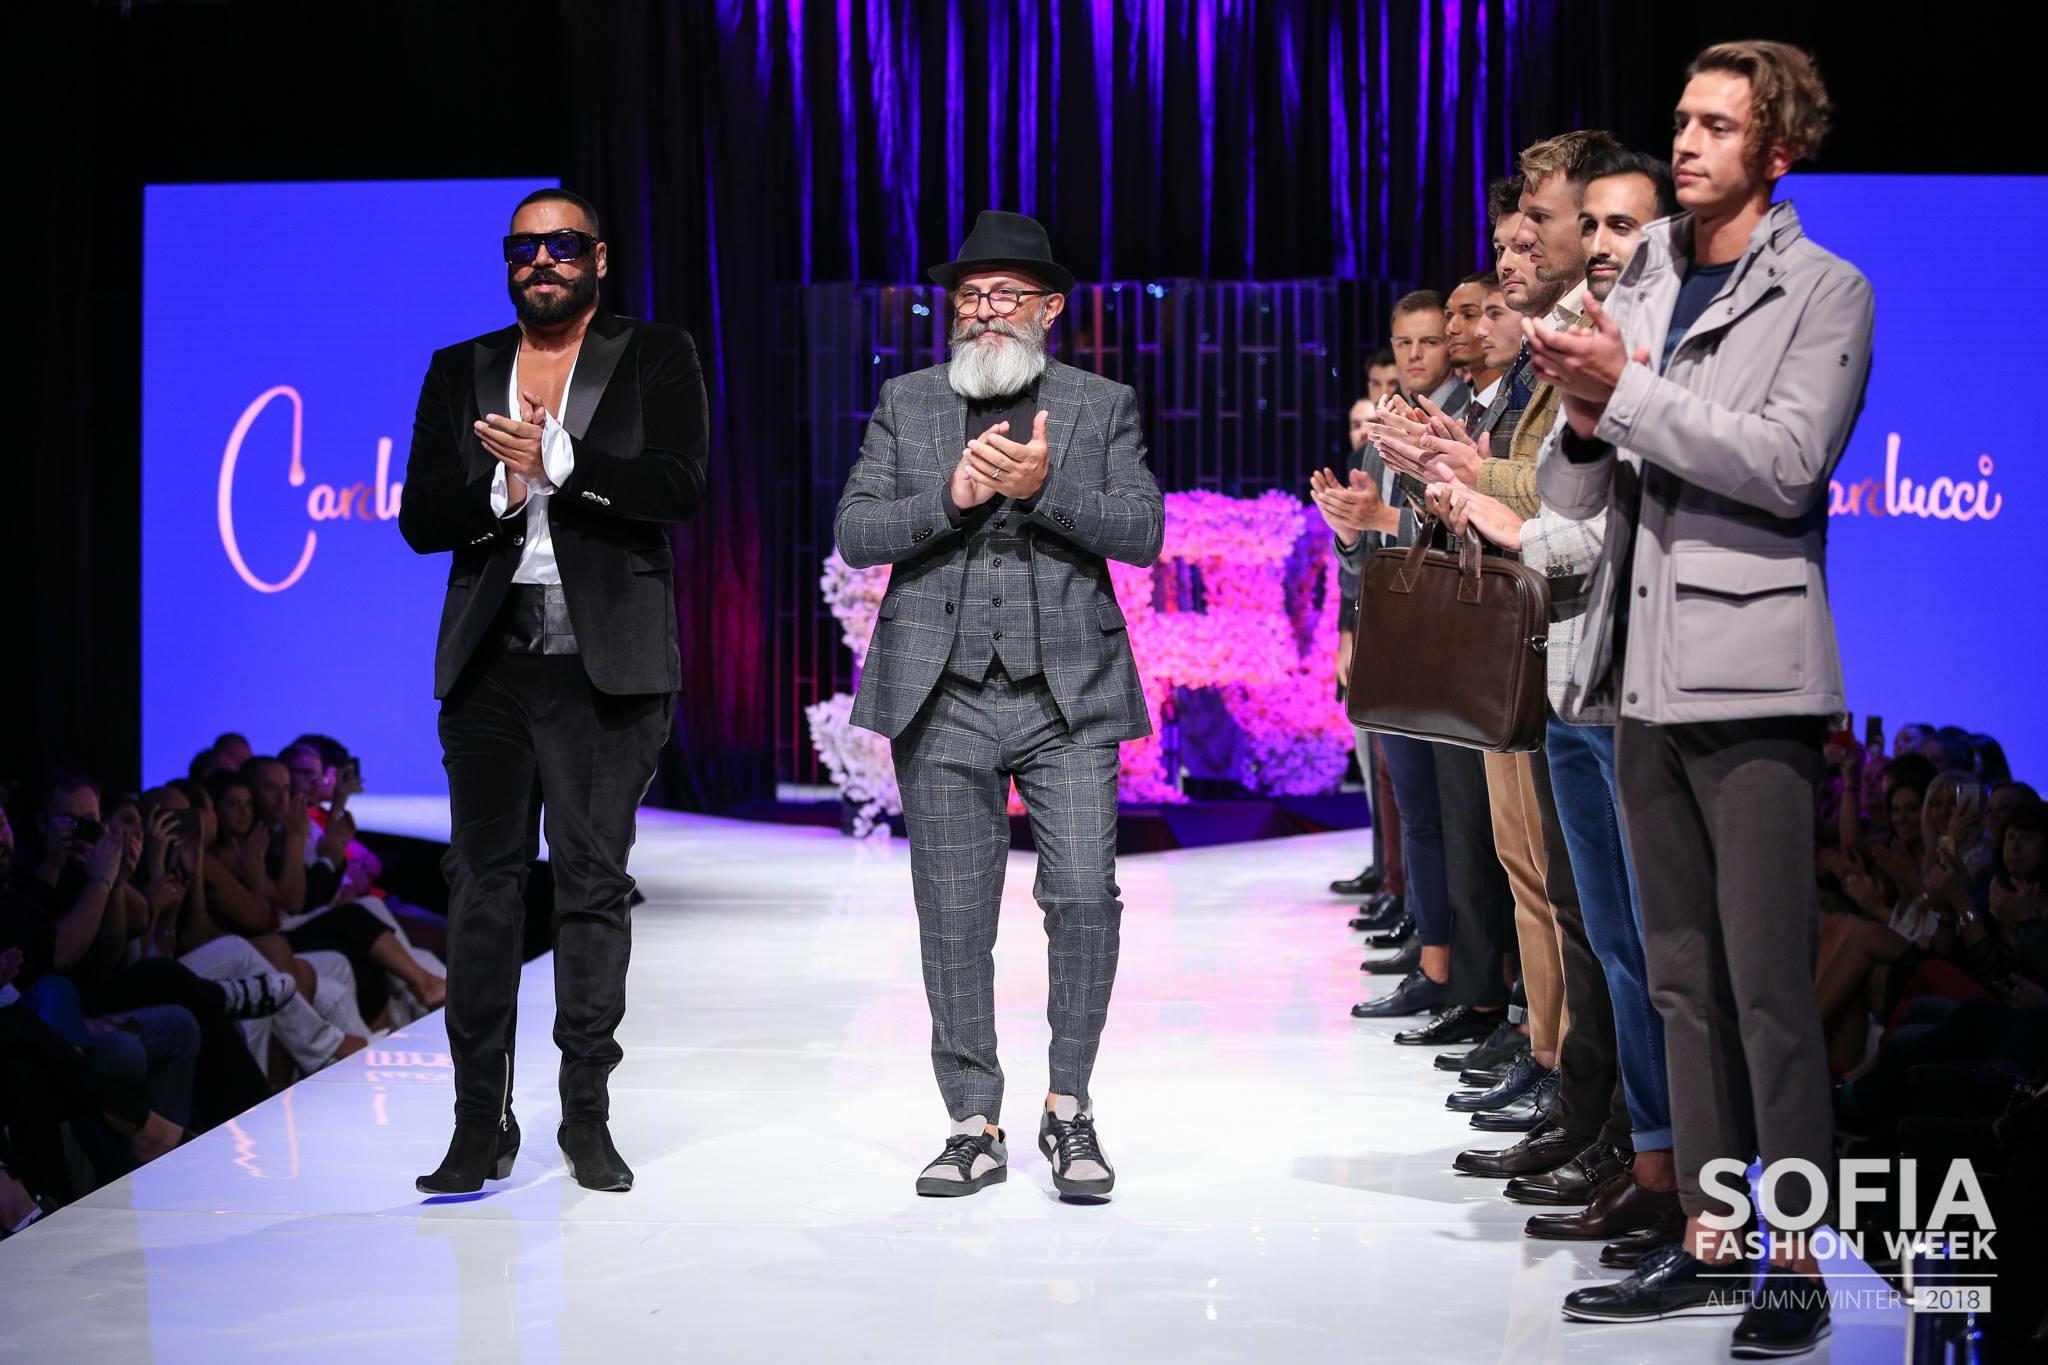 Третата вечер на Sofia Fashion Week AW 2018, откри поп